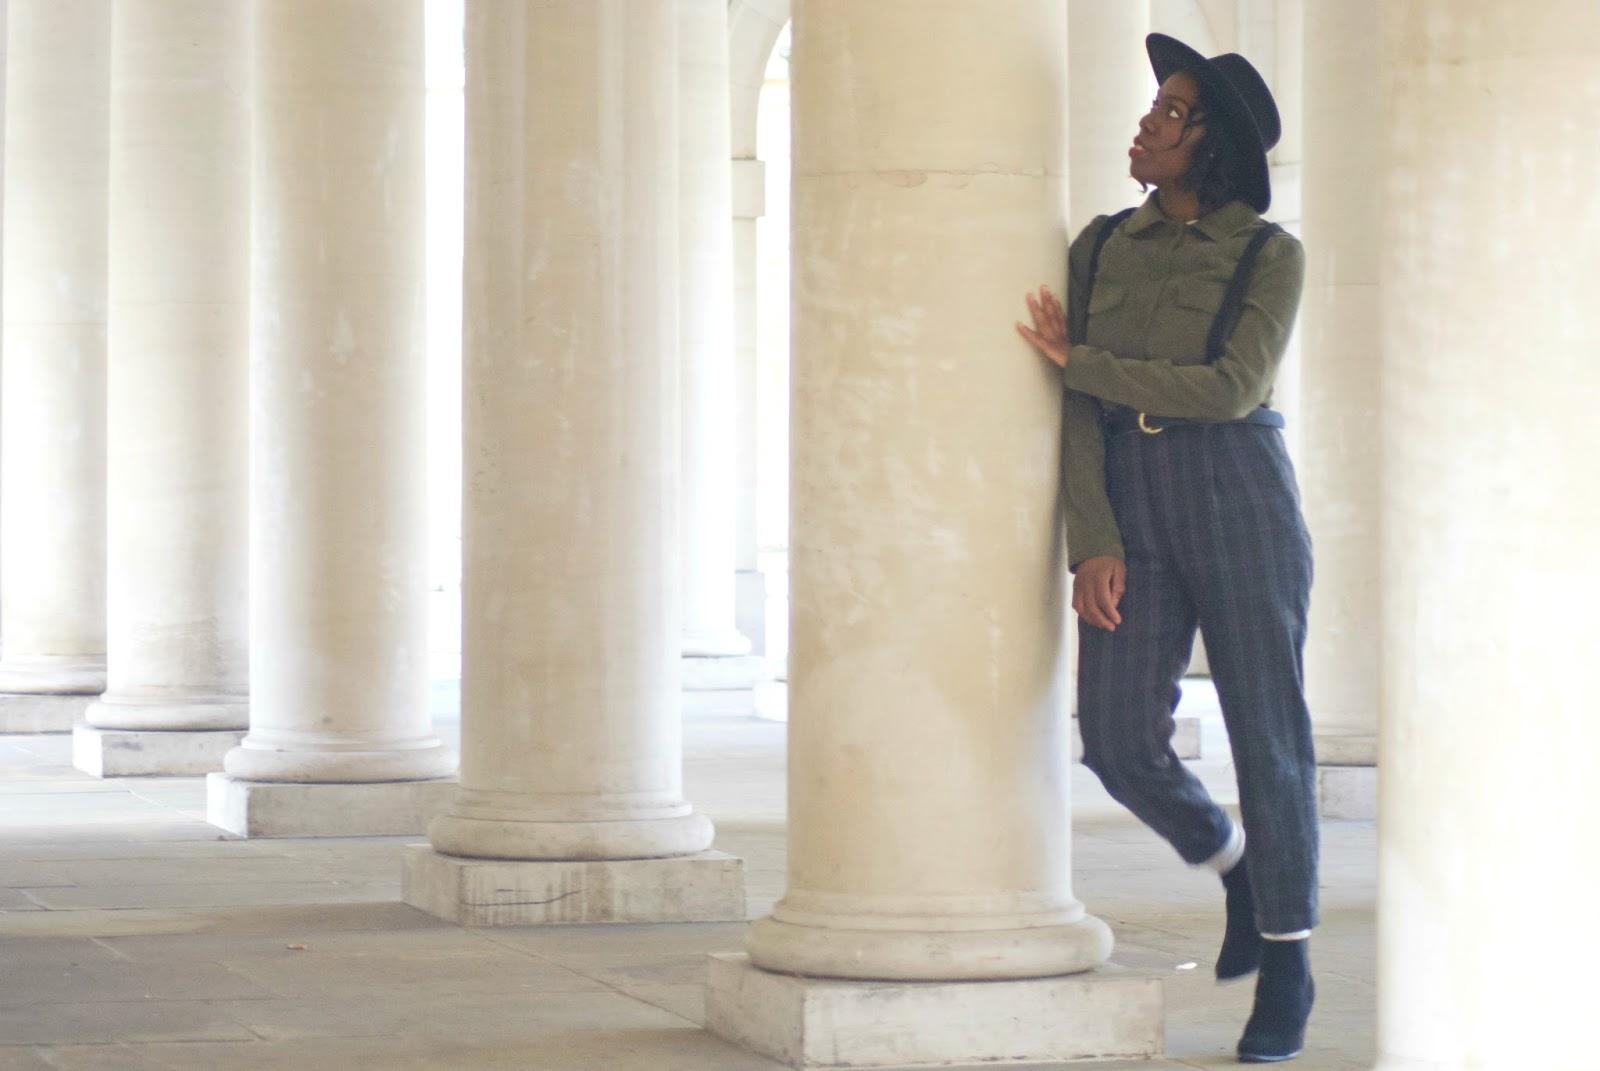 Blogger, Fashion Blogger, Zara plaid trousers, braces, suspenders, corduroy shirt, oversized woman shirt, boohoo oversized shirt, black fedora, asos aviators, temple church area,temple, uk blogger, new look black ankle boots